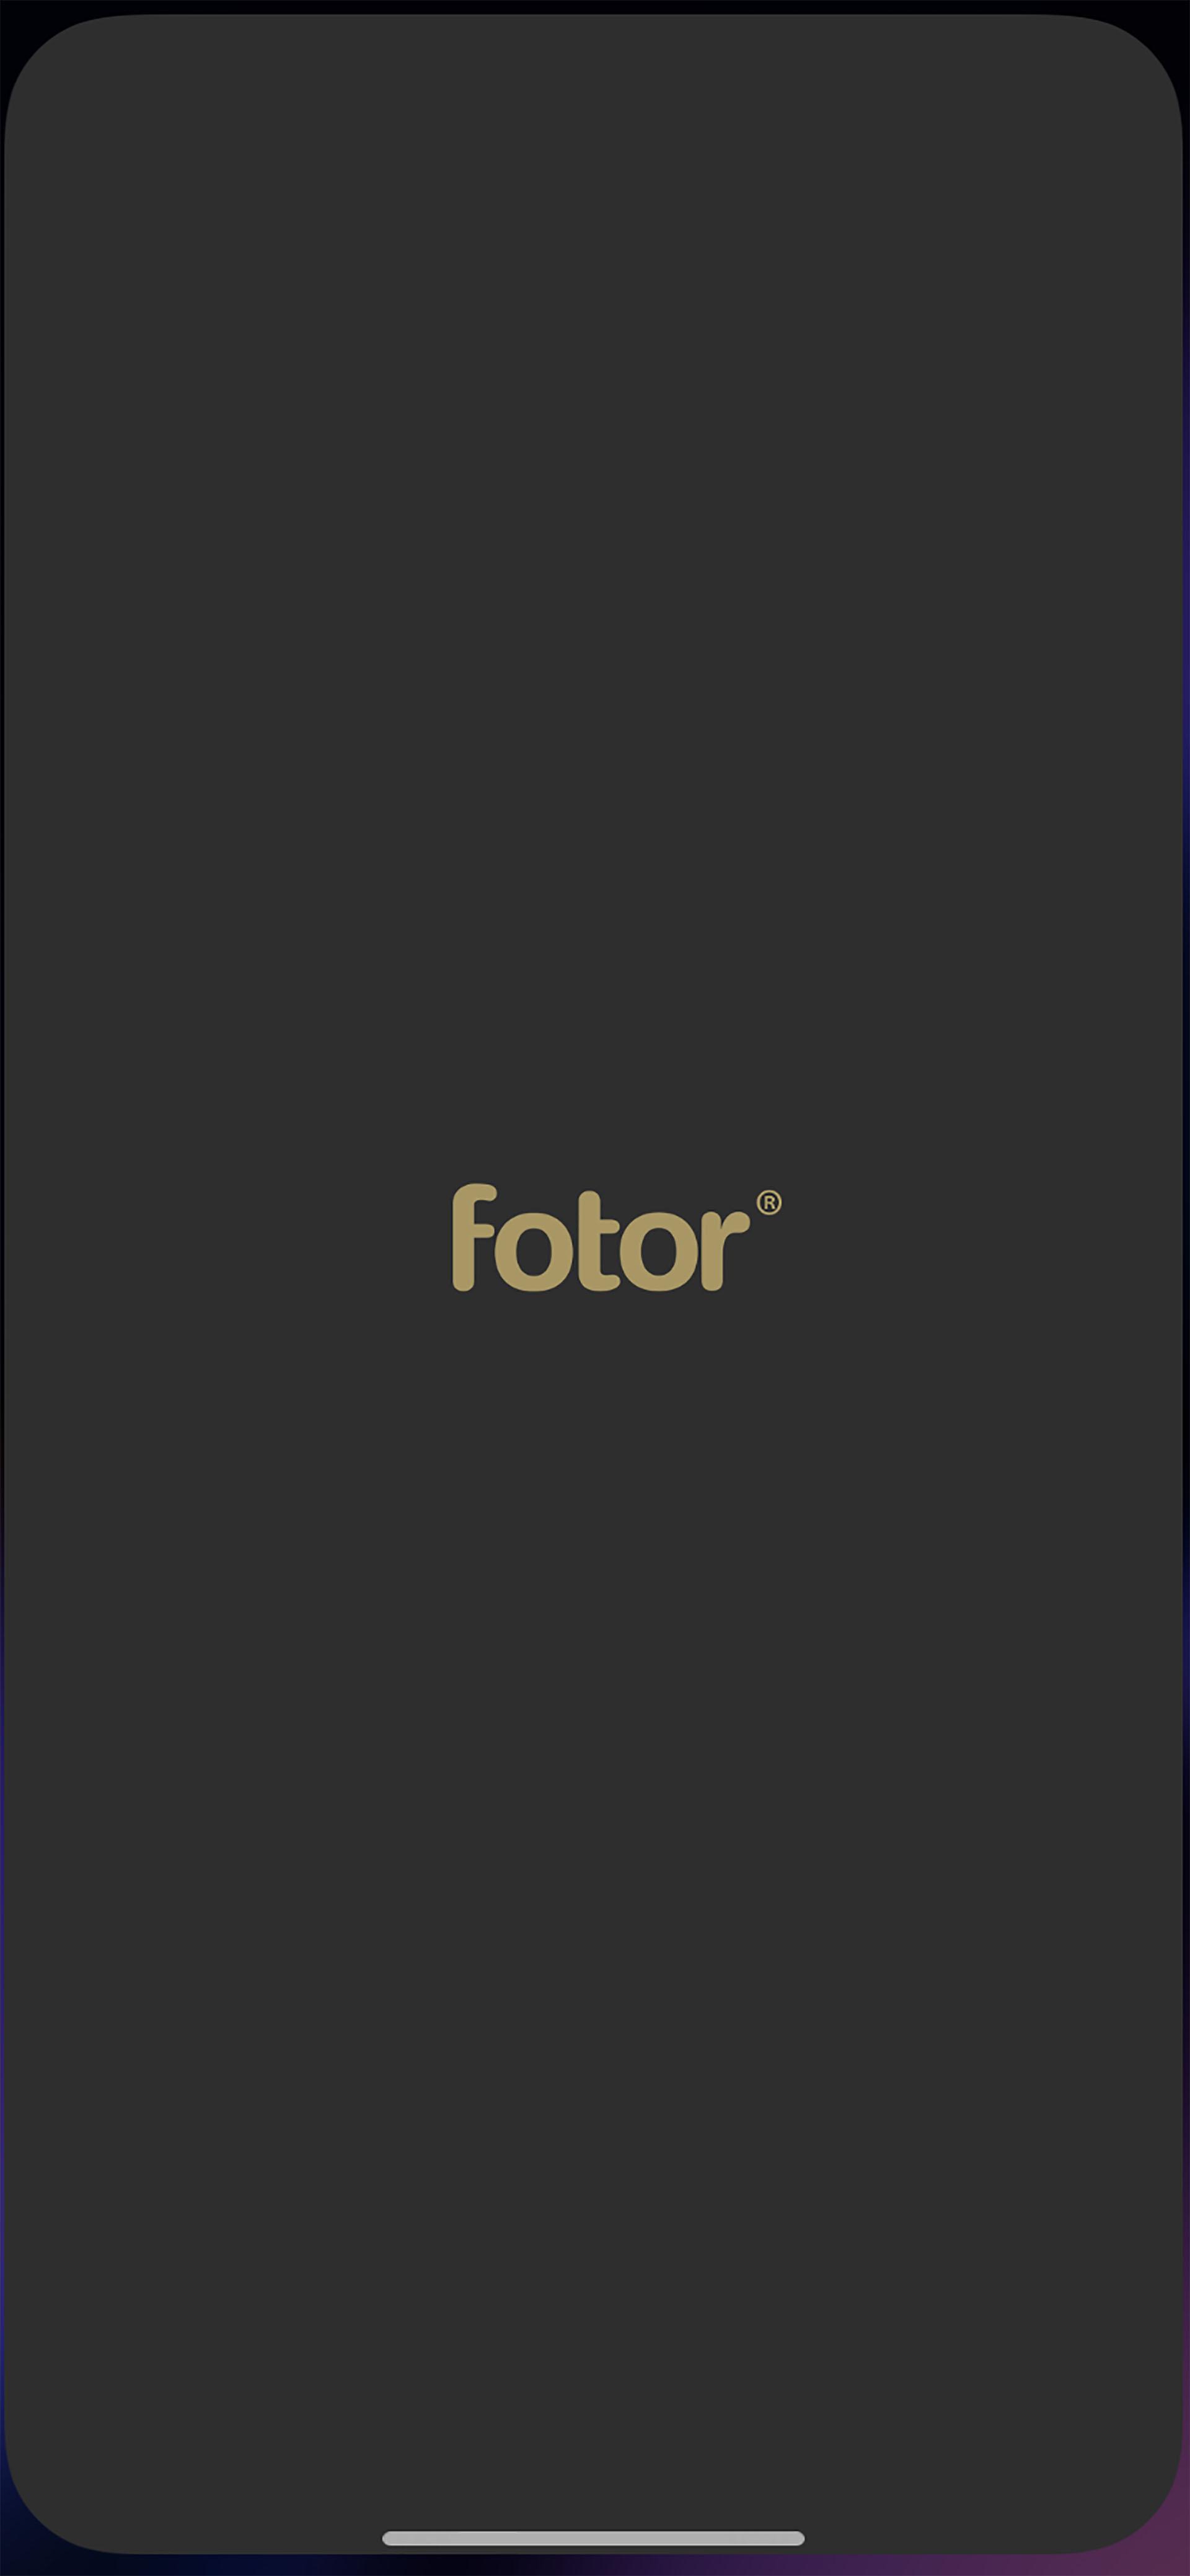 Fotor